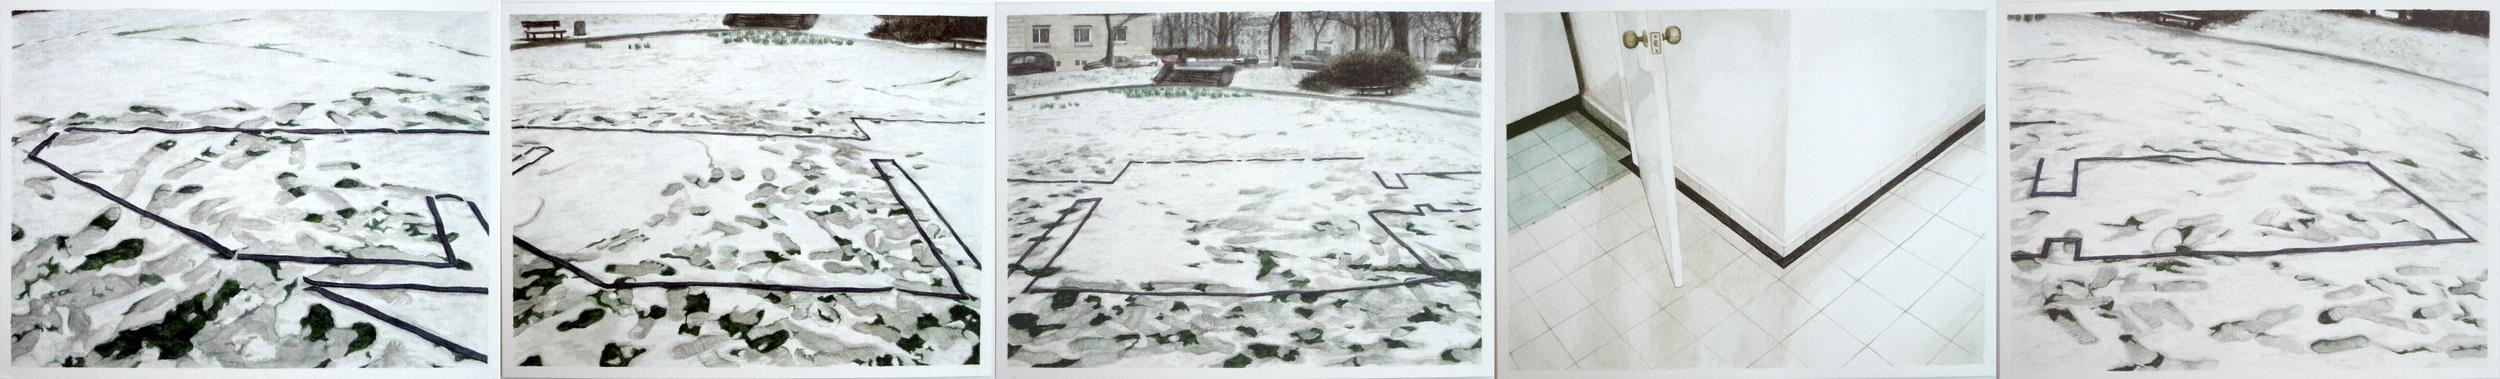 Casa portátil 1 , 2005. Acuarela sobre papel. Políptico 5 piezas,15.5 x 125 cm.